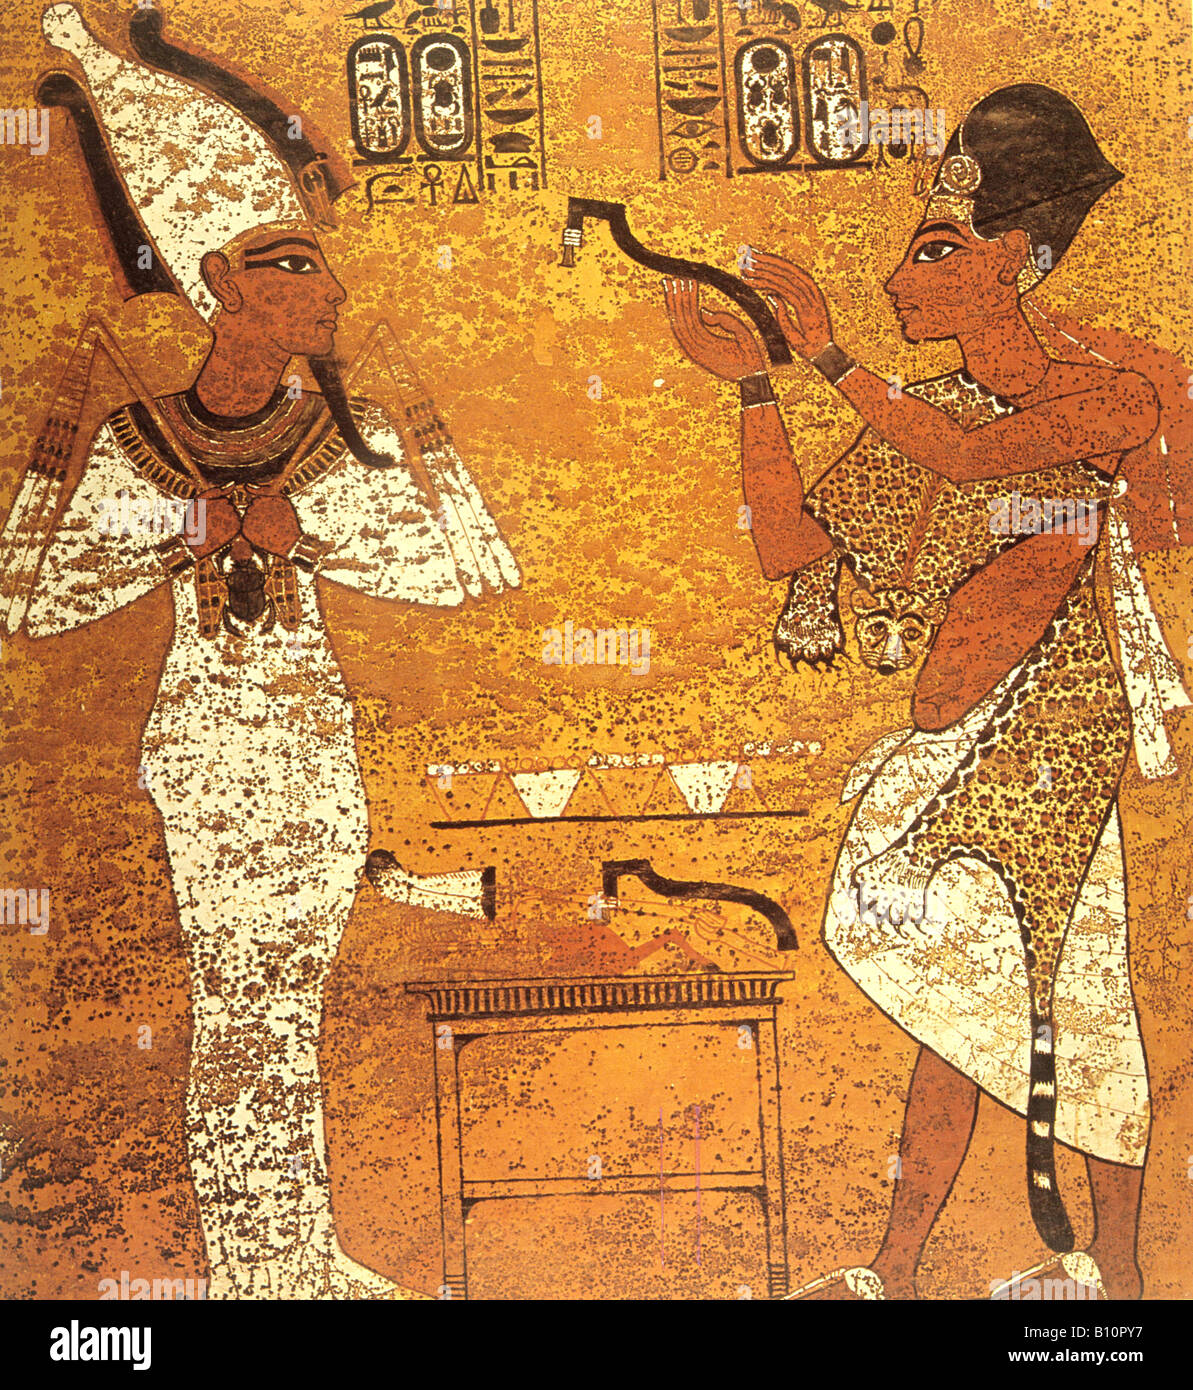 Tutankhamun and Aye fresco Copyright AAAC Ltd - Stock Image